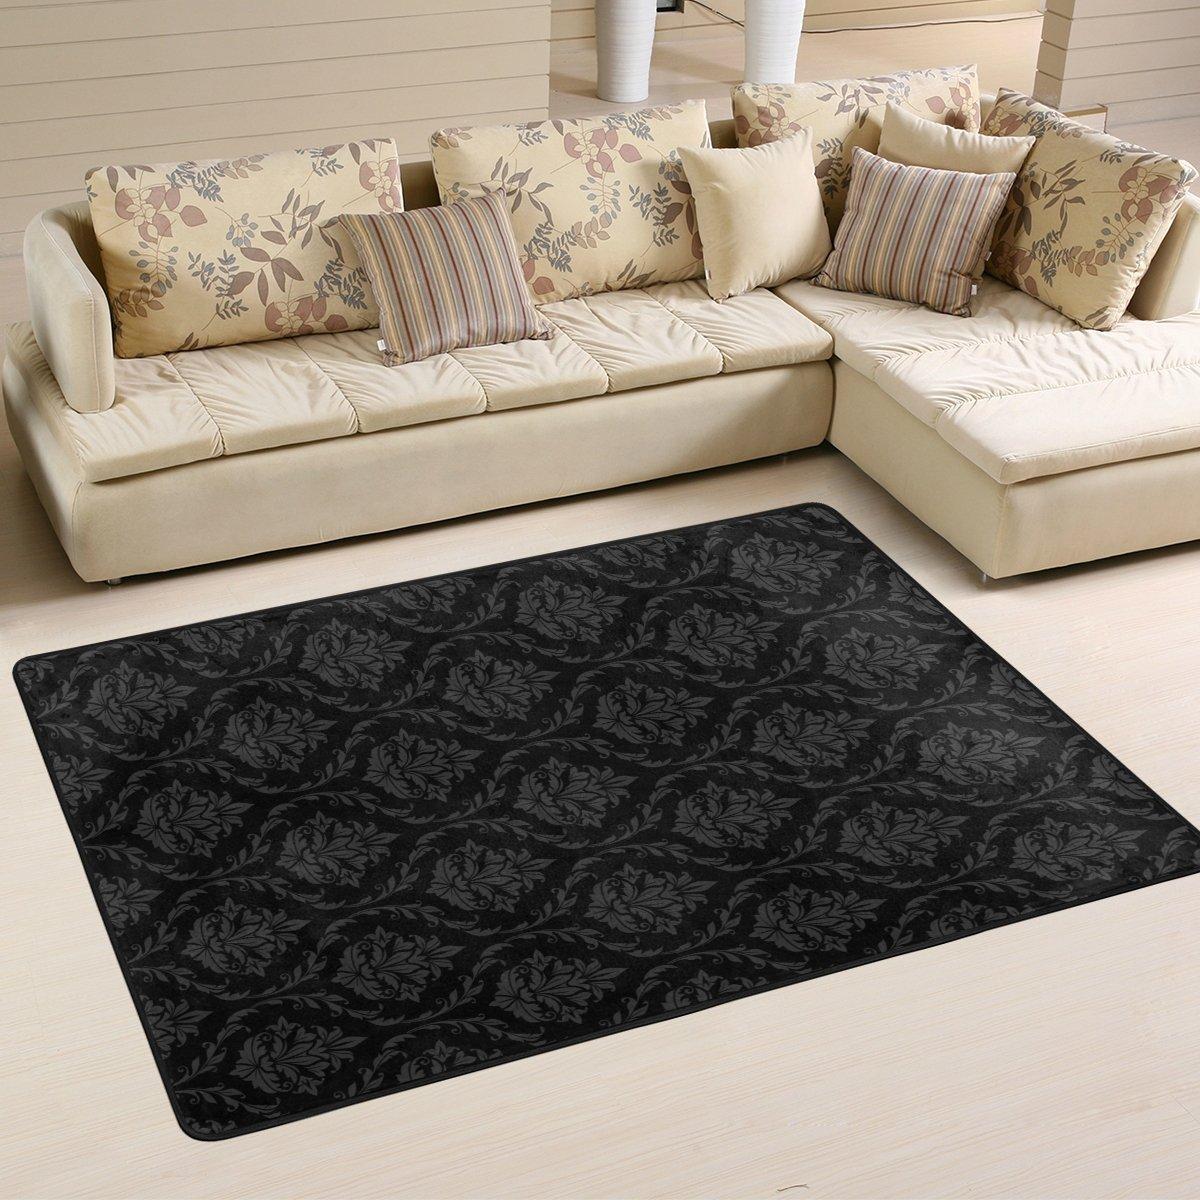 SAVSV 3' x 2' Area Rug Carpet Doormat Lightweight Printed Black Vintage Pattern Easy to Clean For Living Room Bedroom